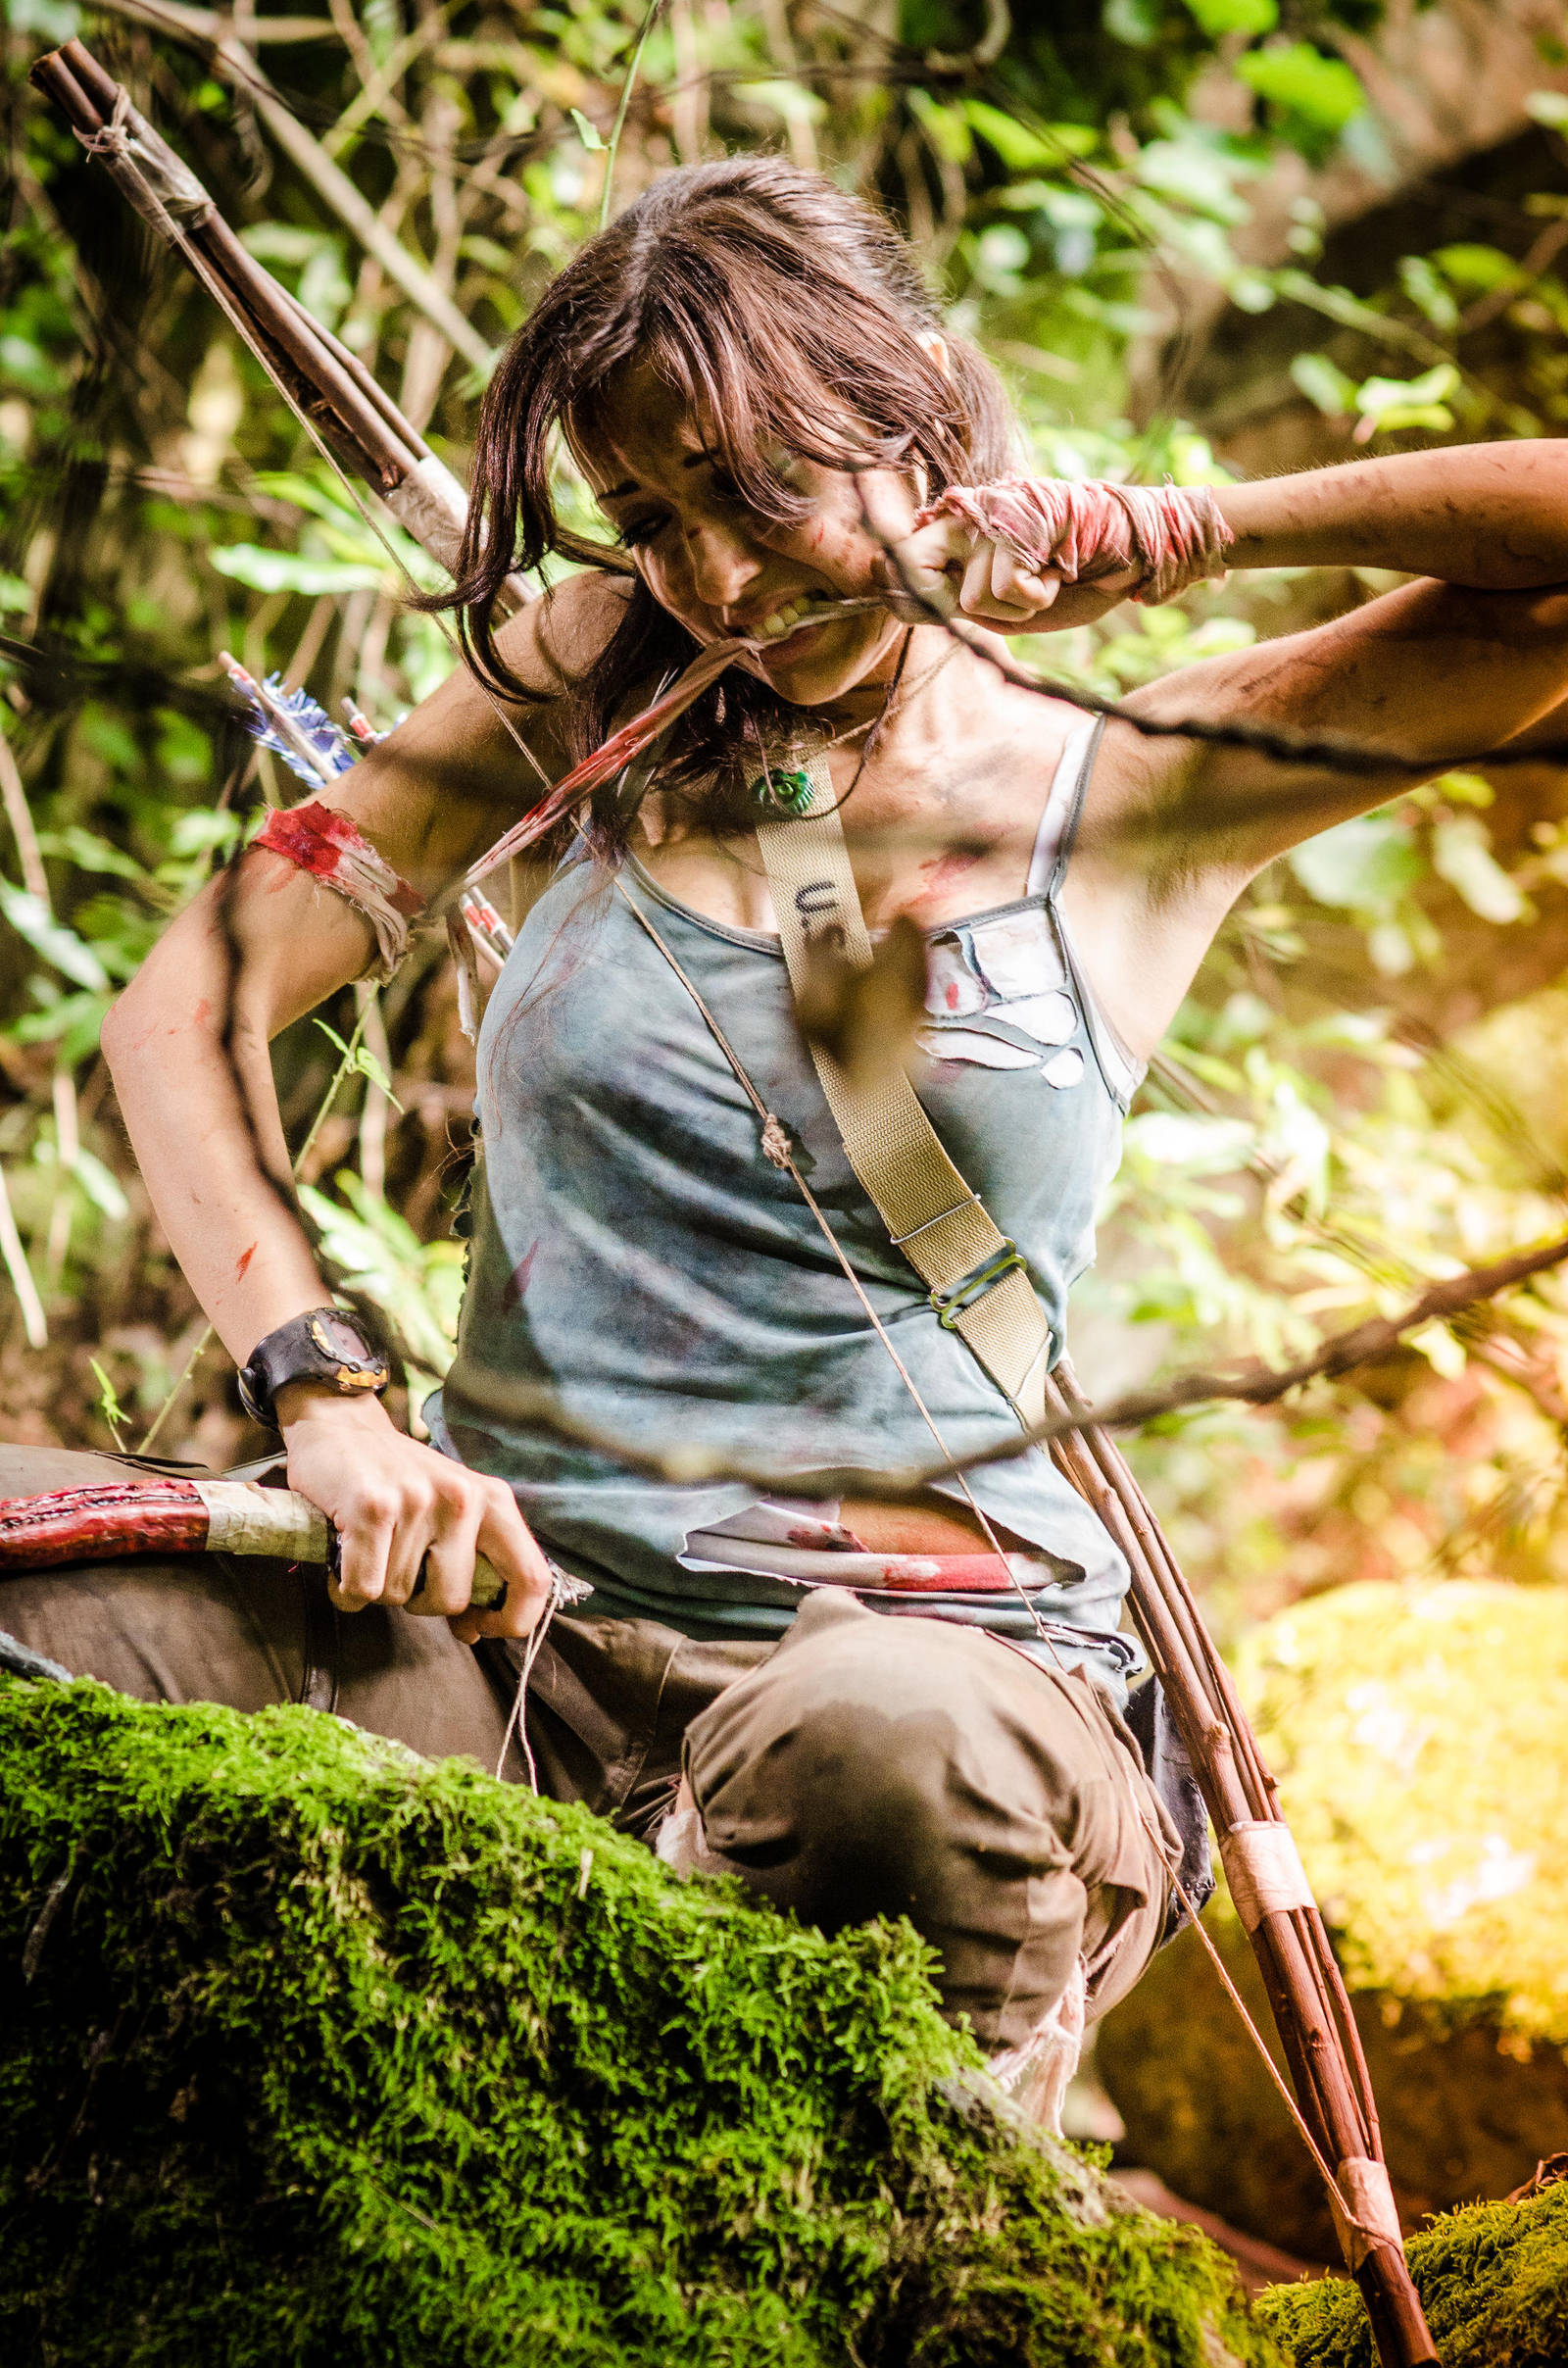 Lara Croft by stregatt0